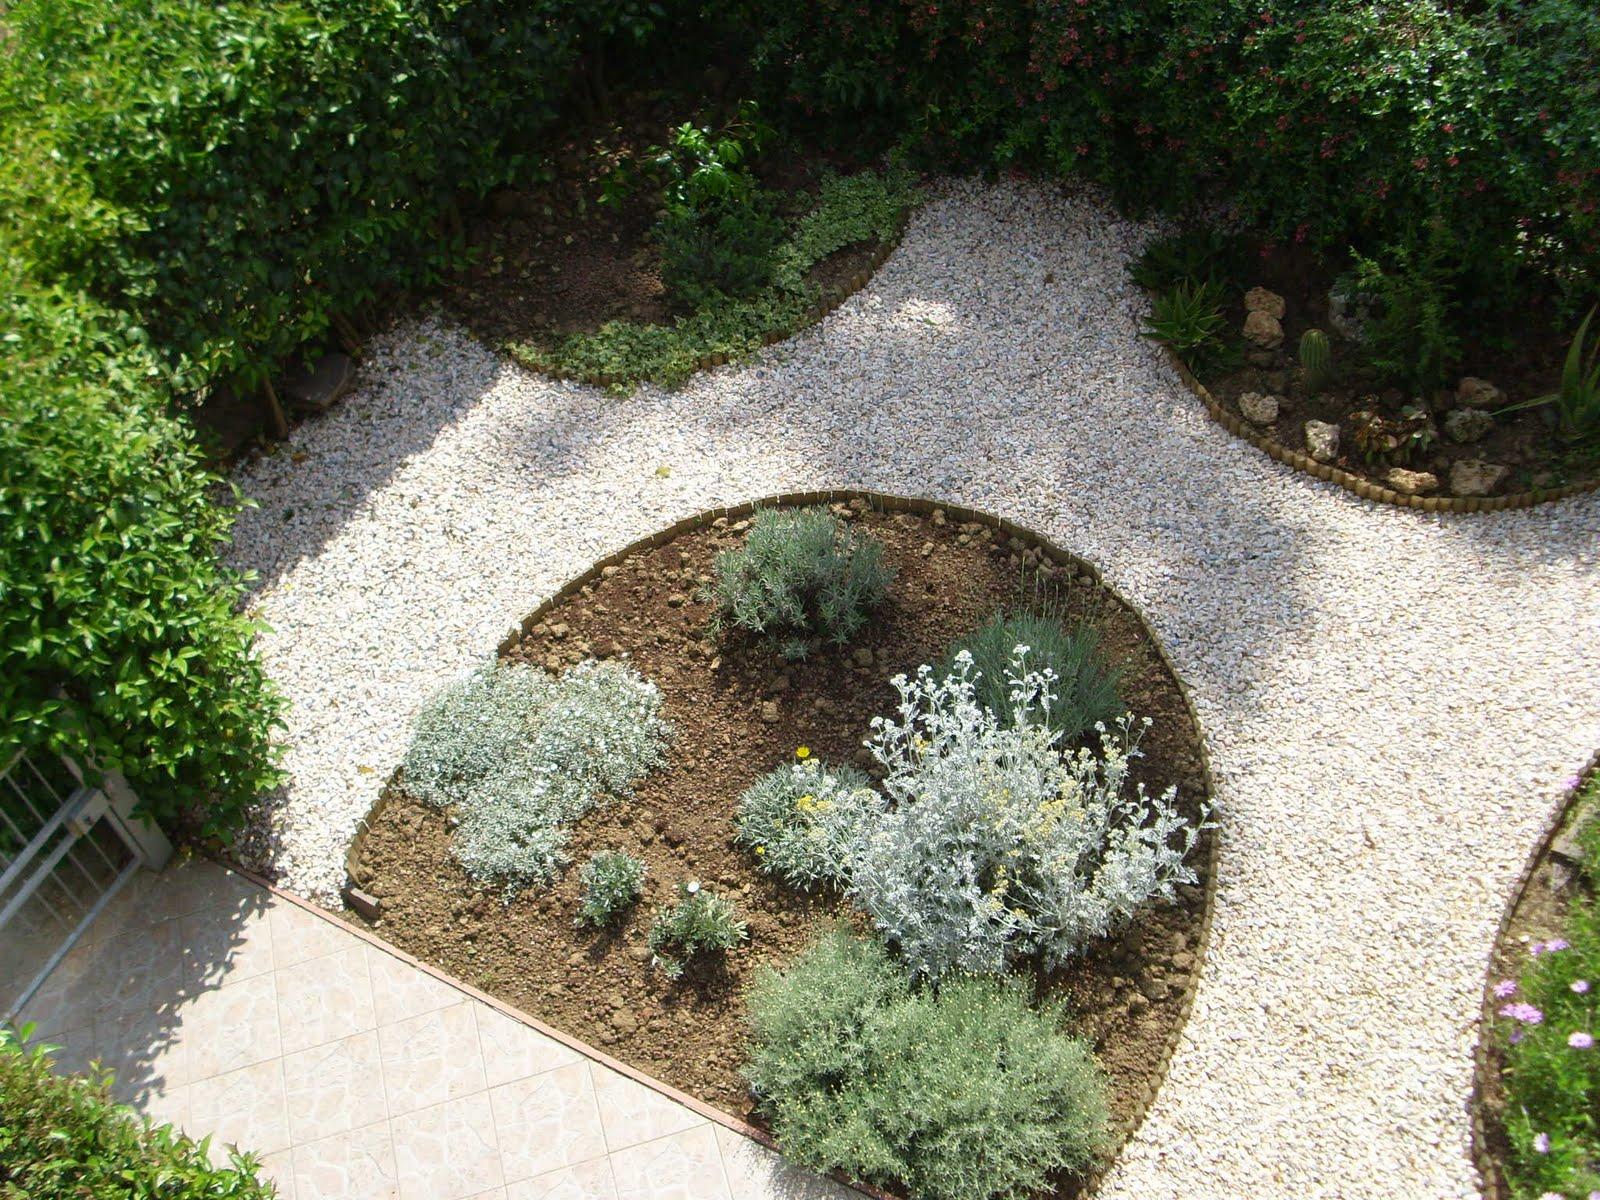 I giardini di carlo e letizia il giardino di giuseppina - Ghiaia da giardino ...